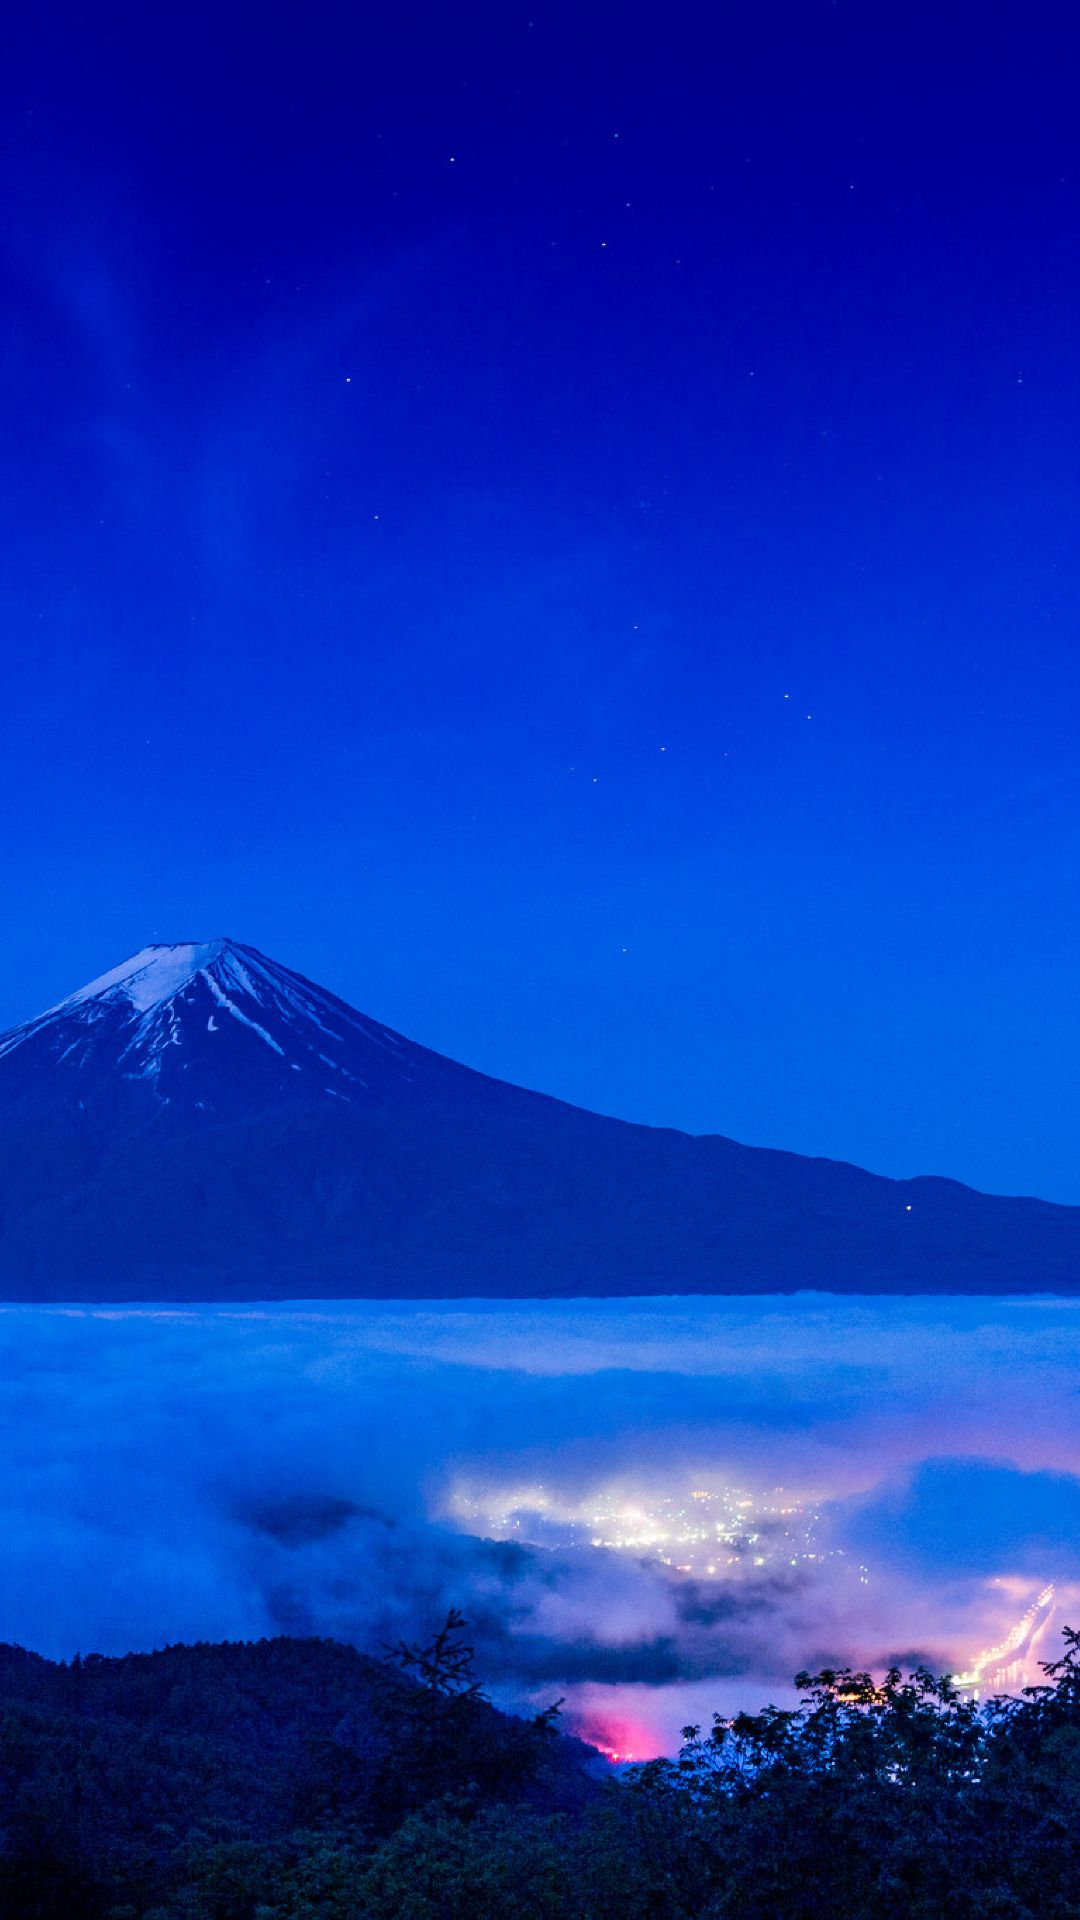 Mount Fuji Beautiful Shot Full Hd 2k Wallpaper 49 Japan 4k Wallpaper On Wallpapersafari Explore Japan Night Sky Wallpaper Cool Backgrounds Landscape Wallpaper